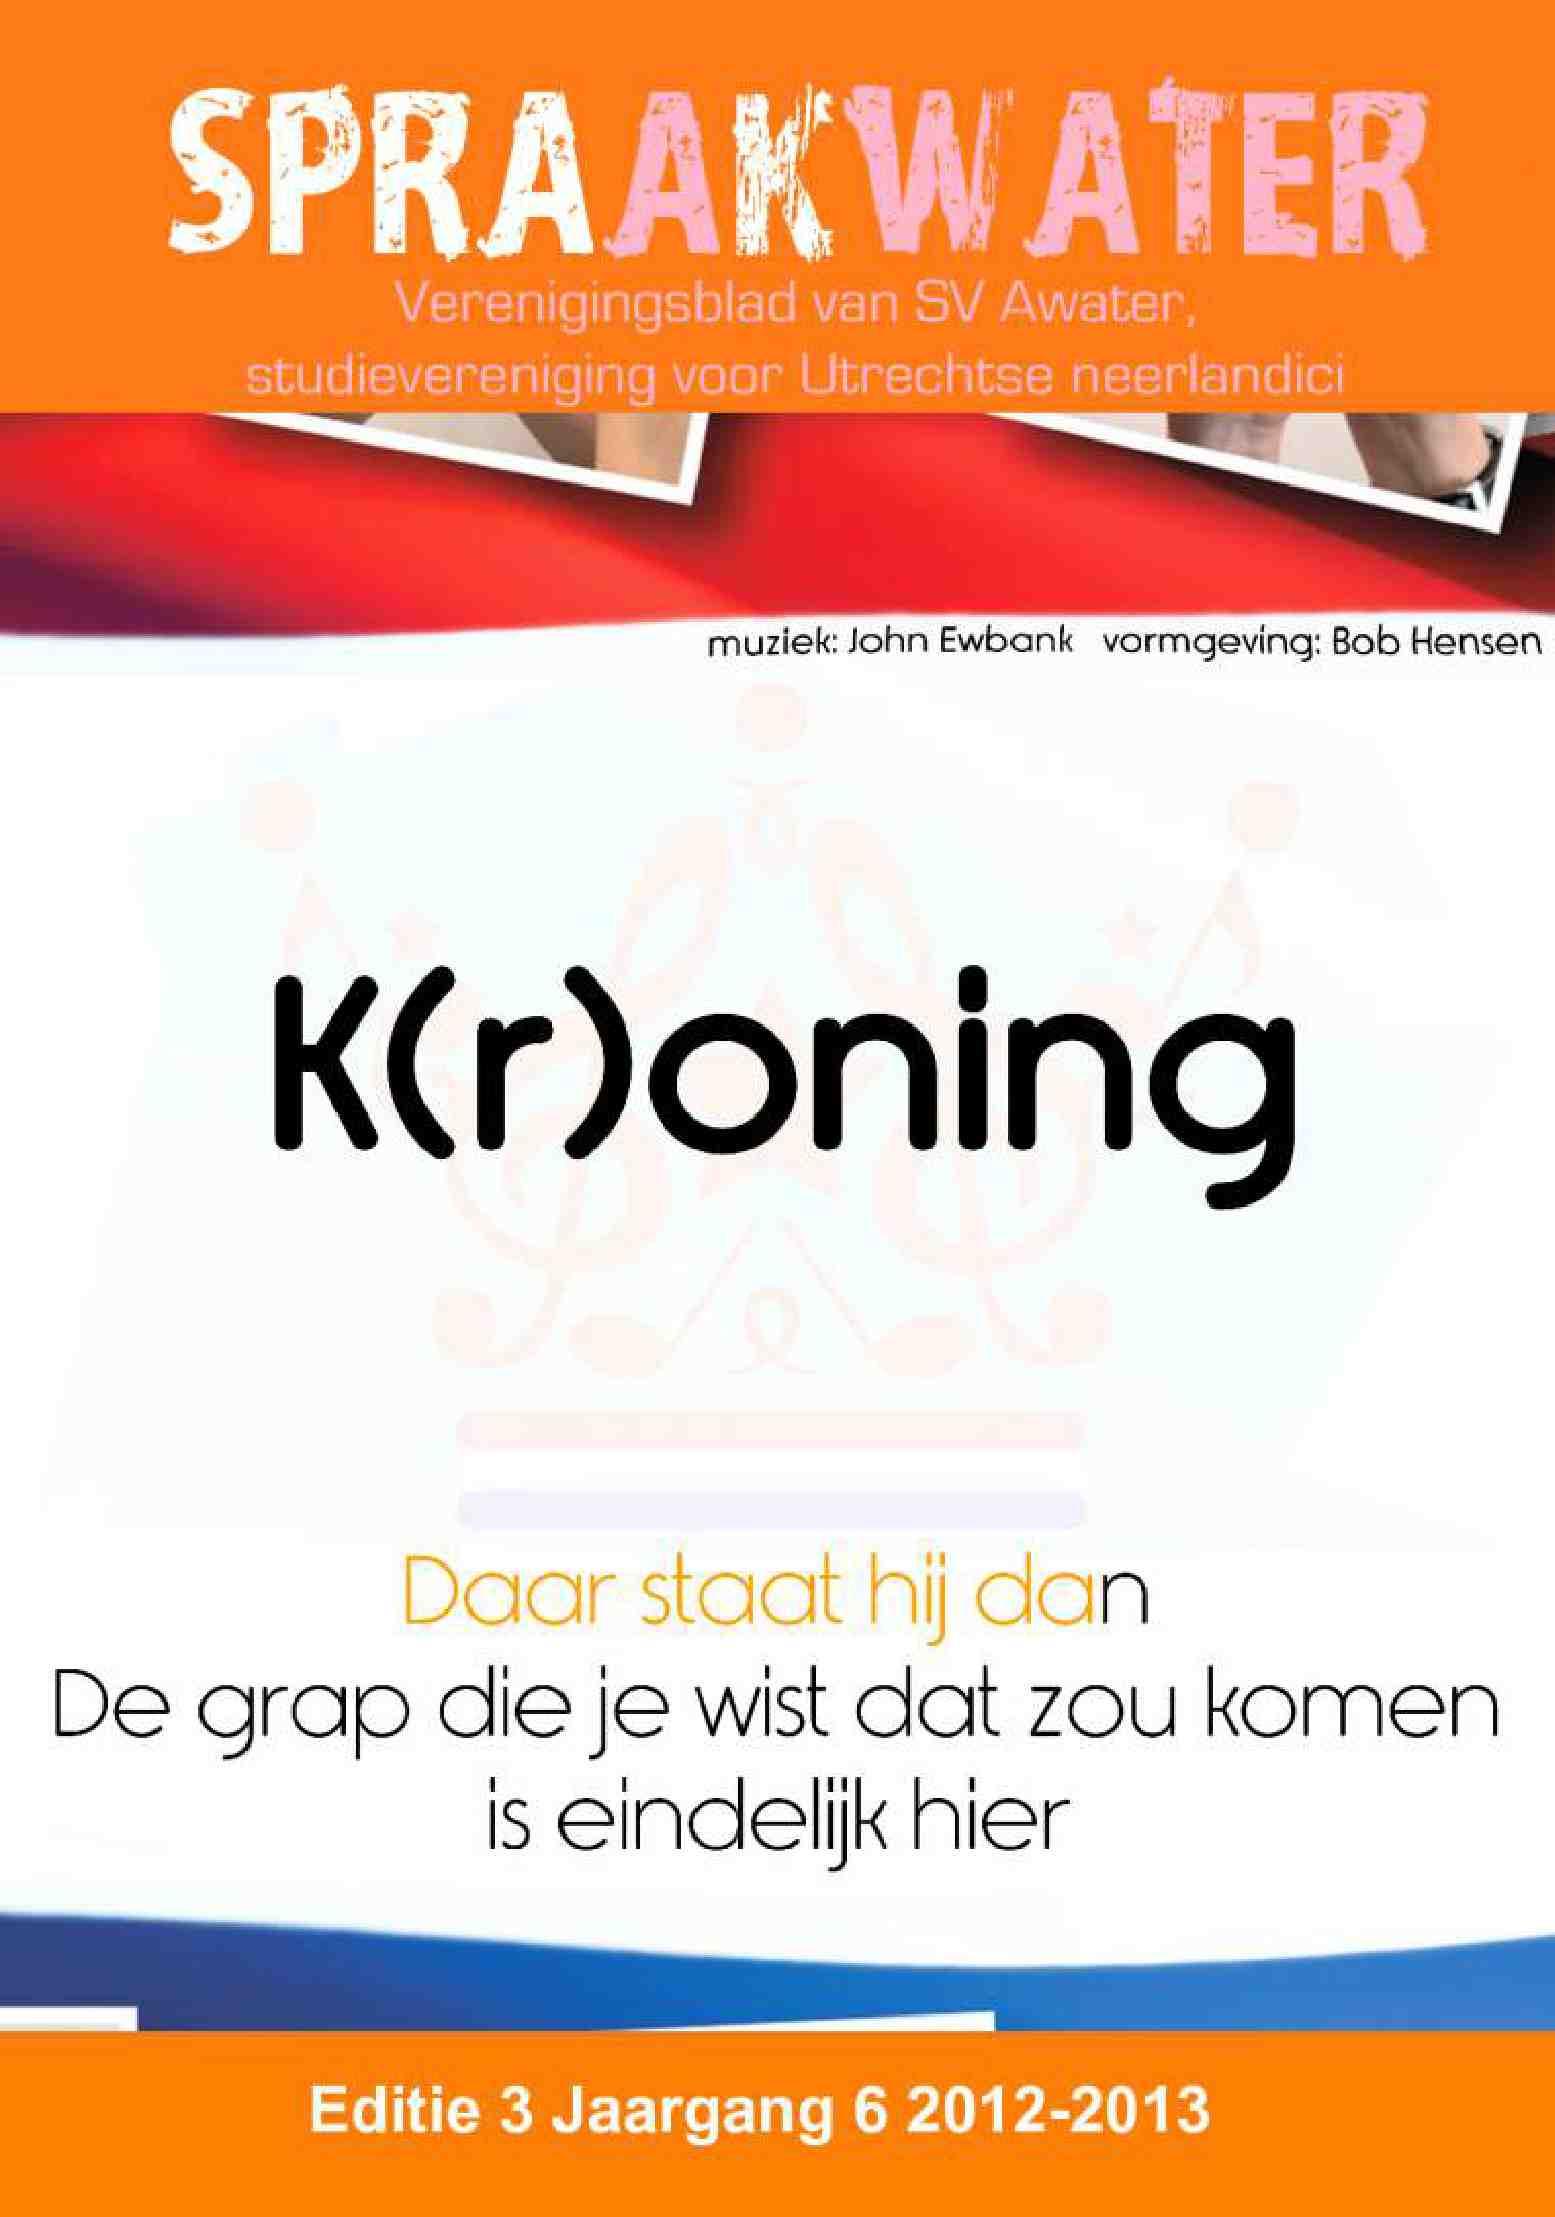 Cover editie mei 2013